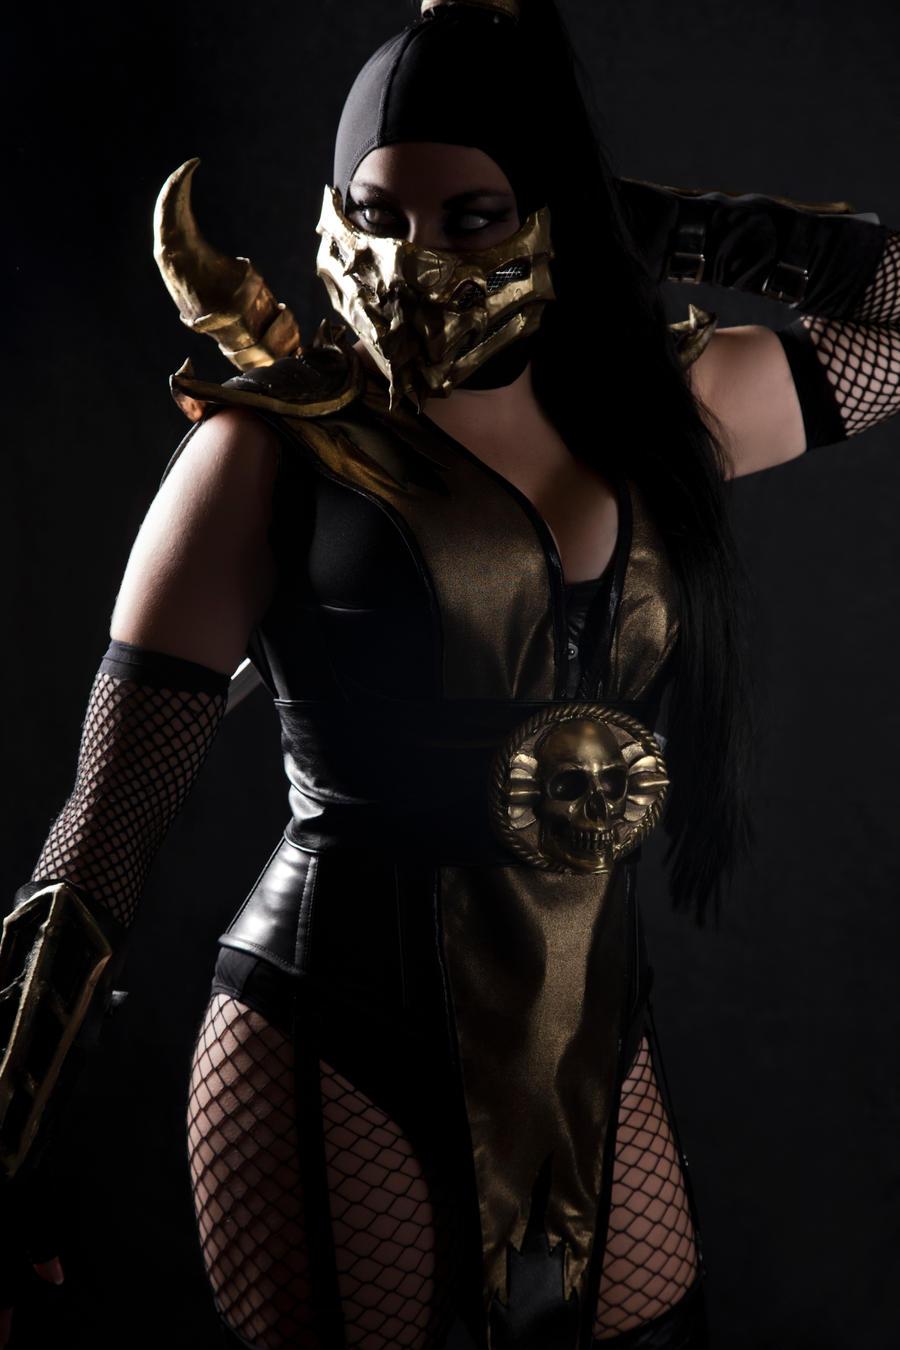 Lady Scorpion by Sheik19